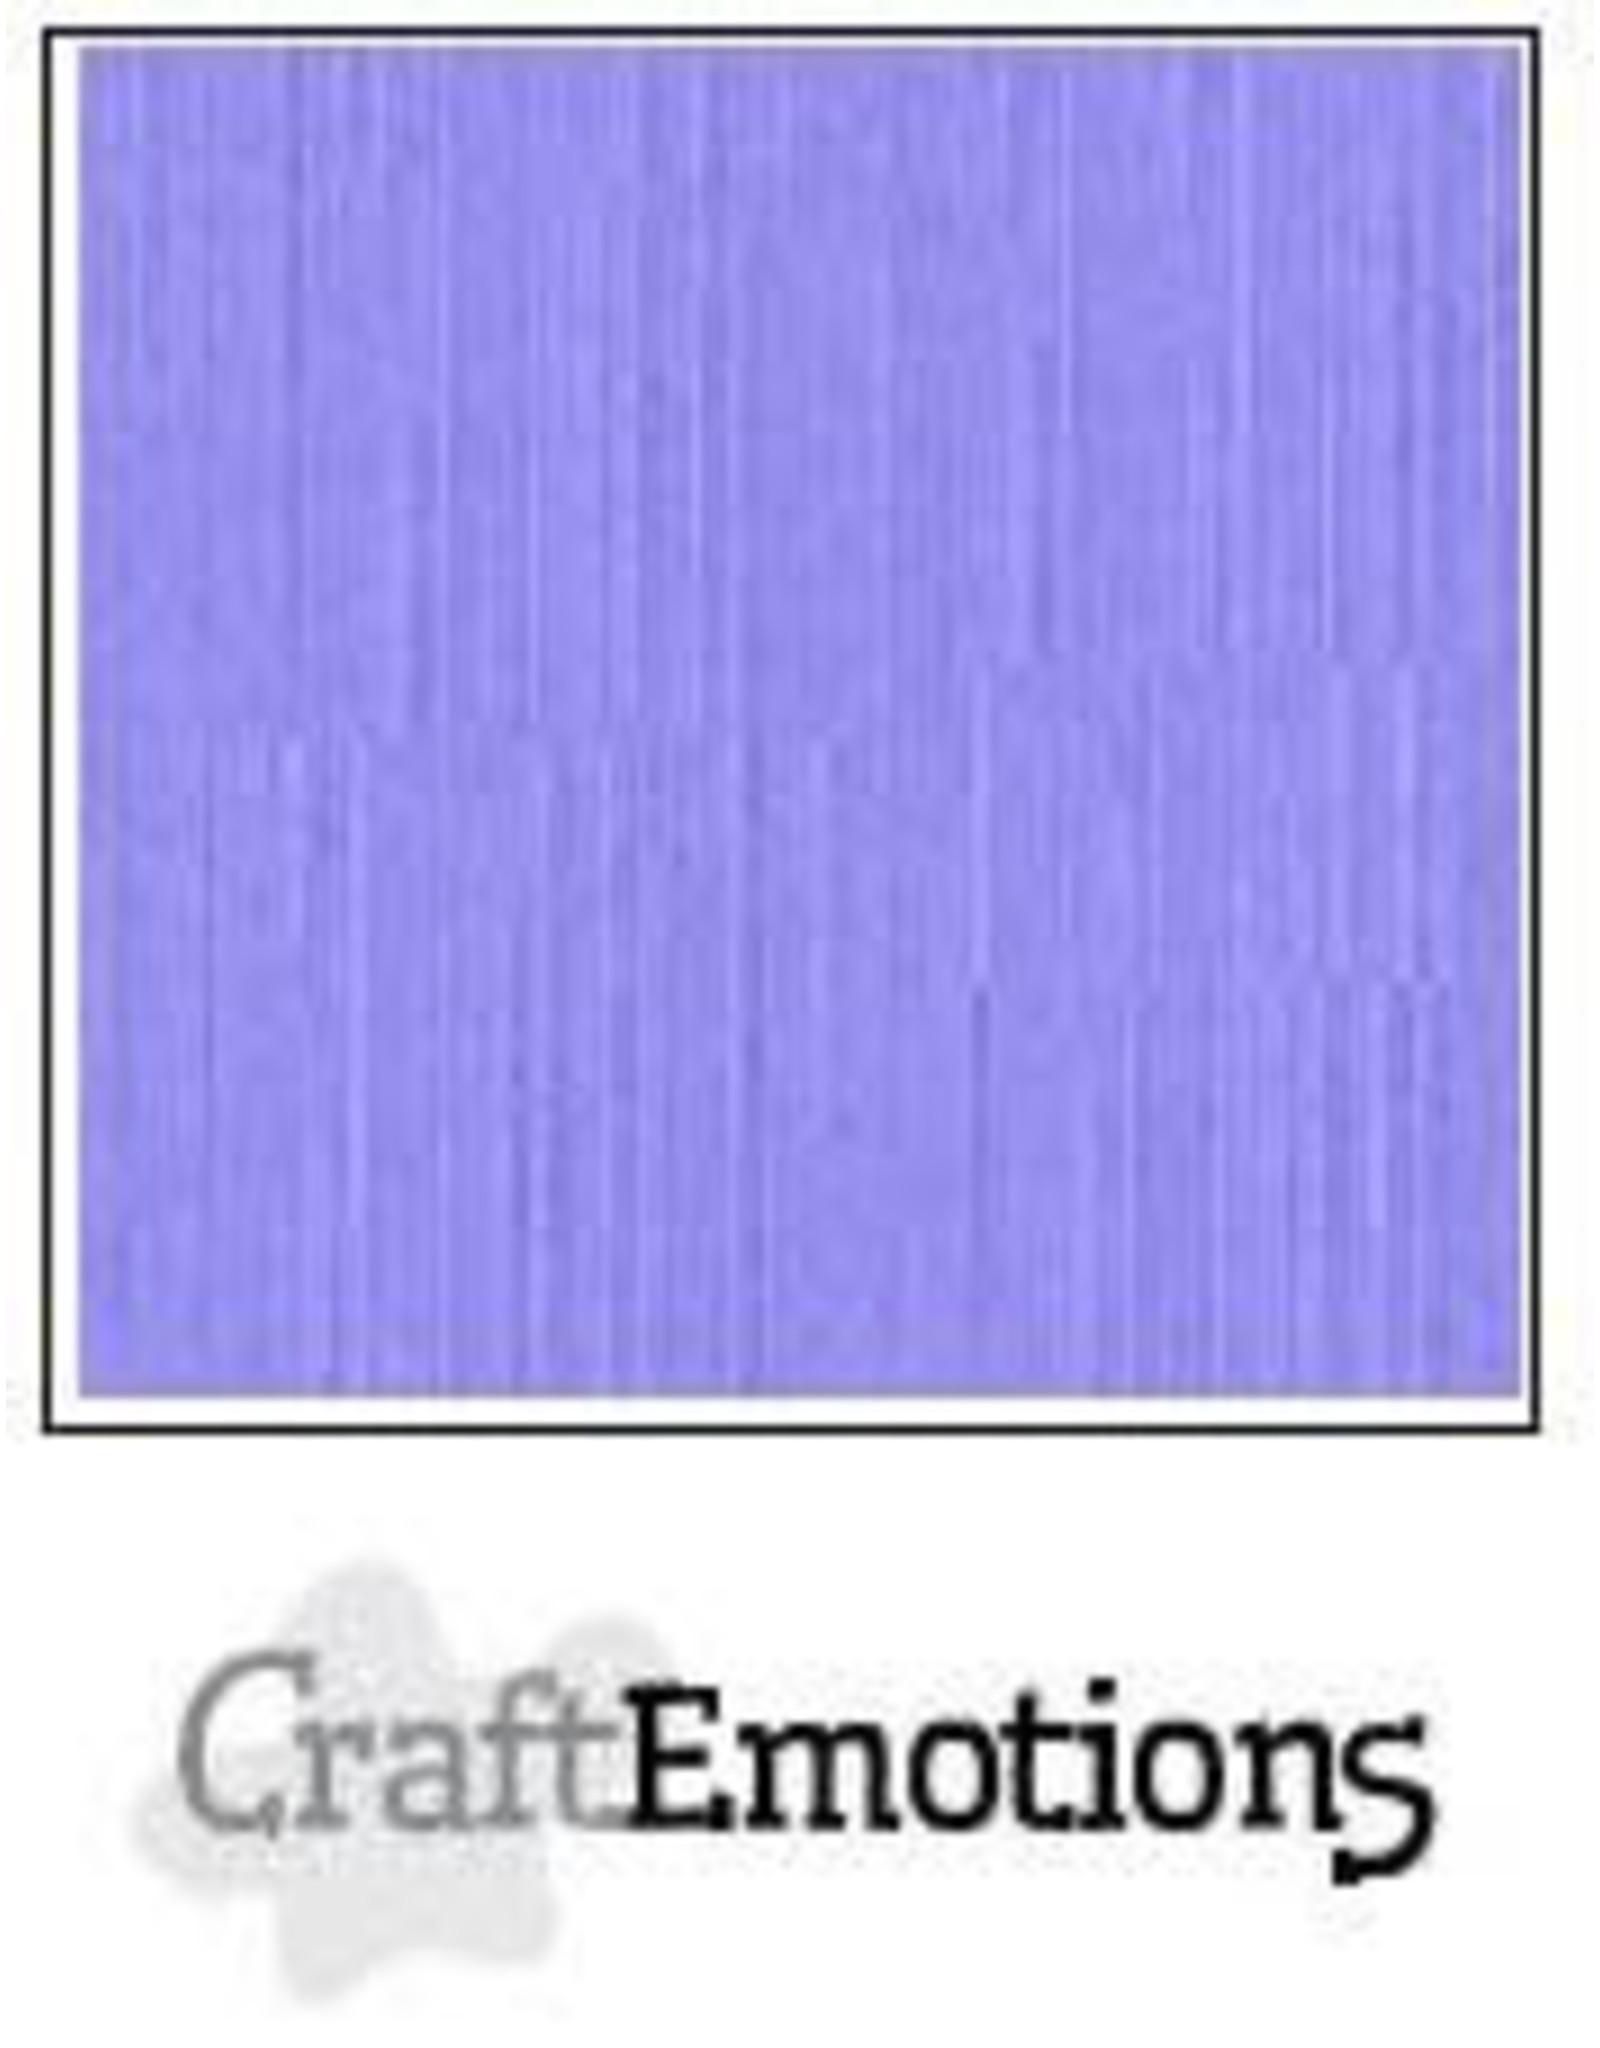 Craft Emotions CraftEmotions linnenkarton heide pastel 30,0x30,0cm